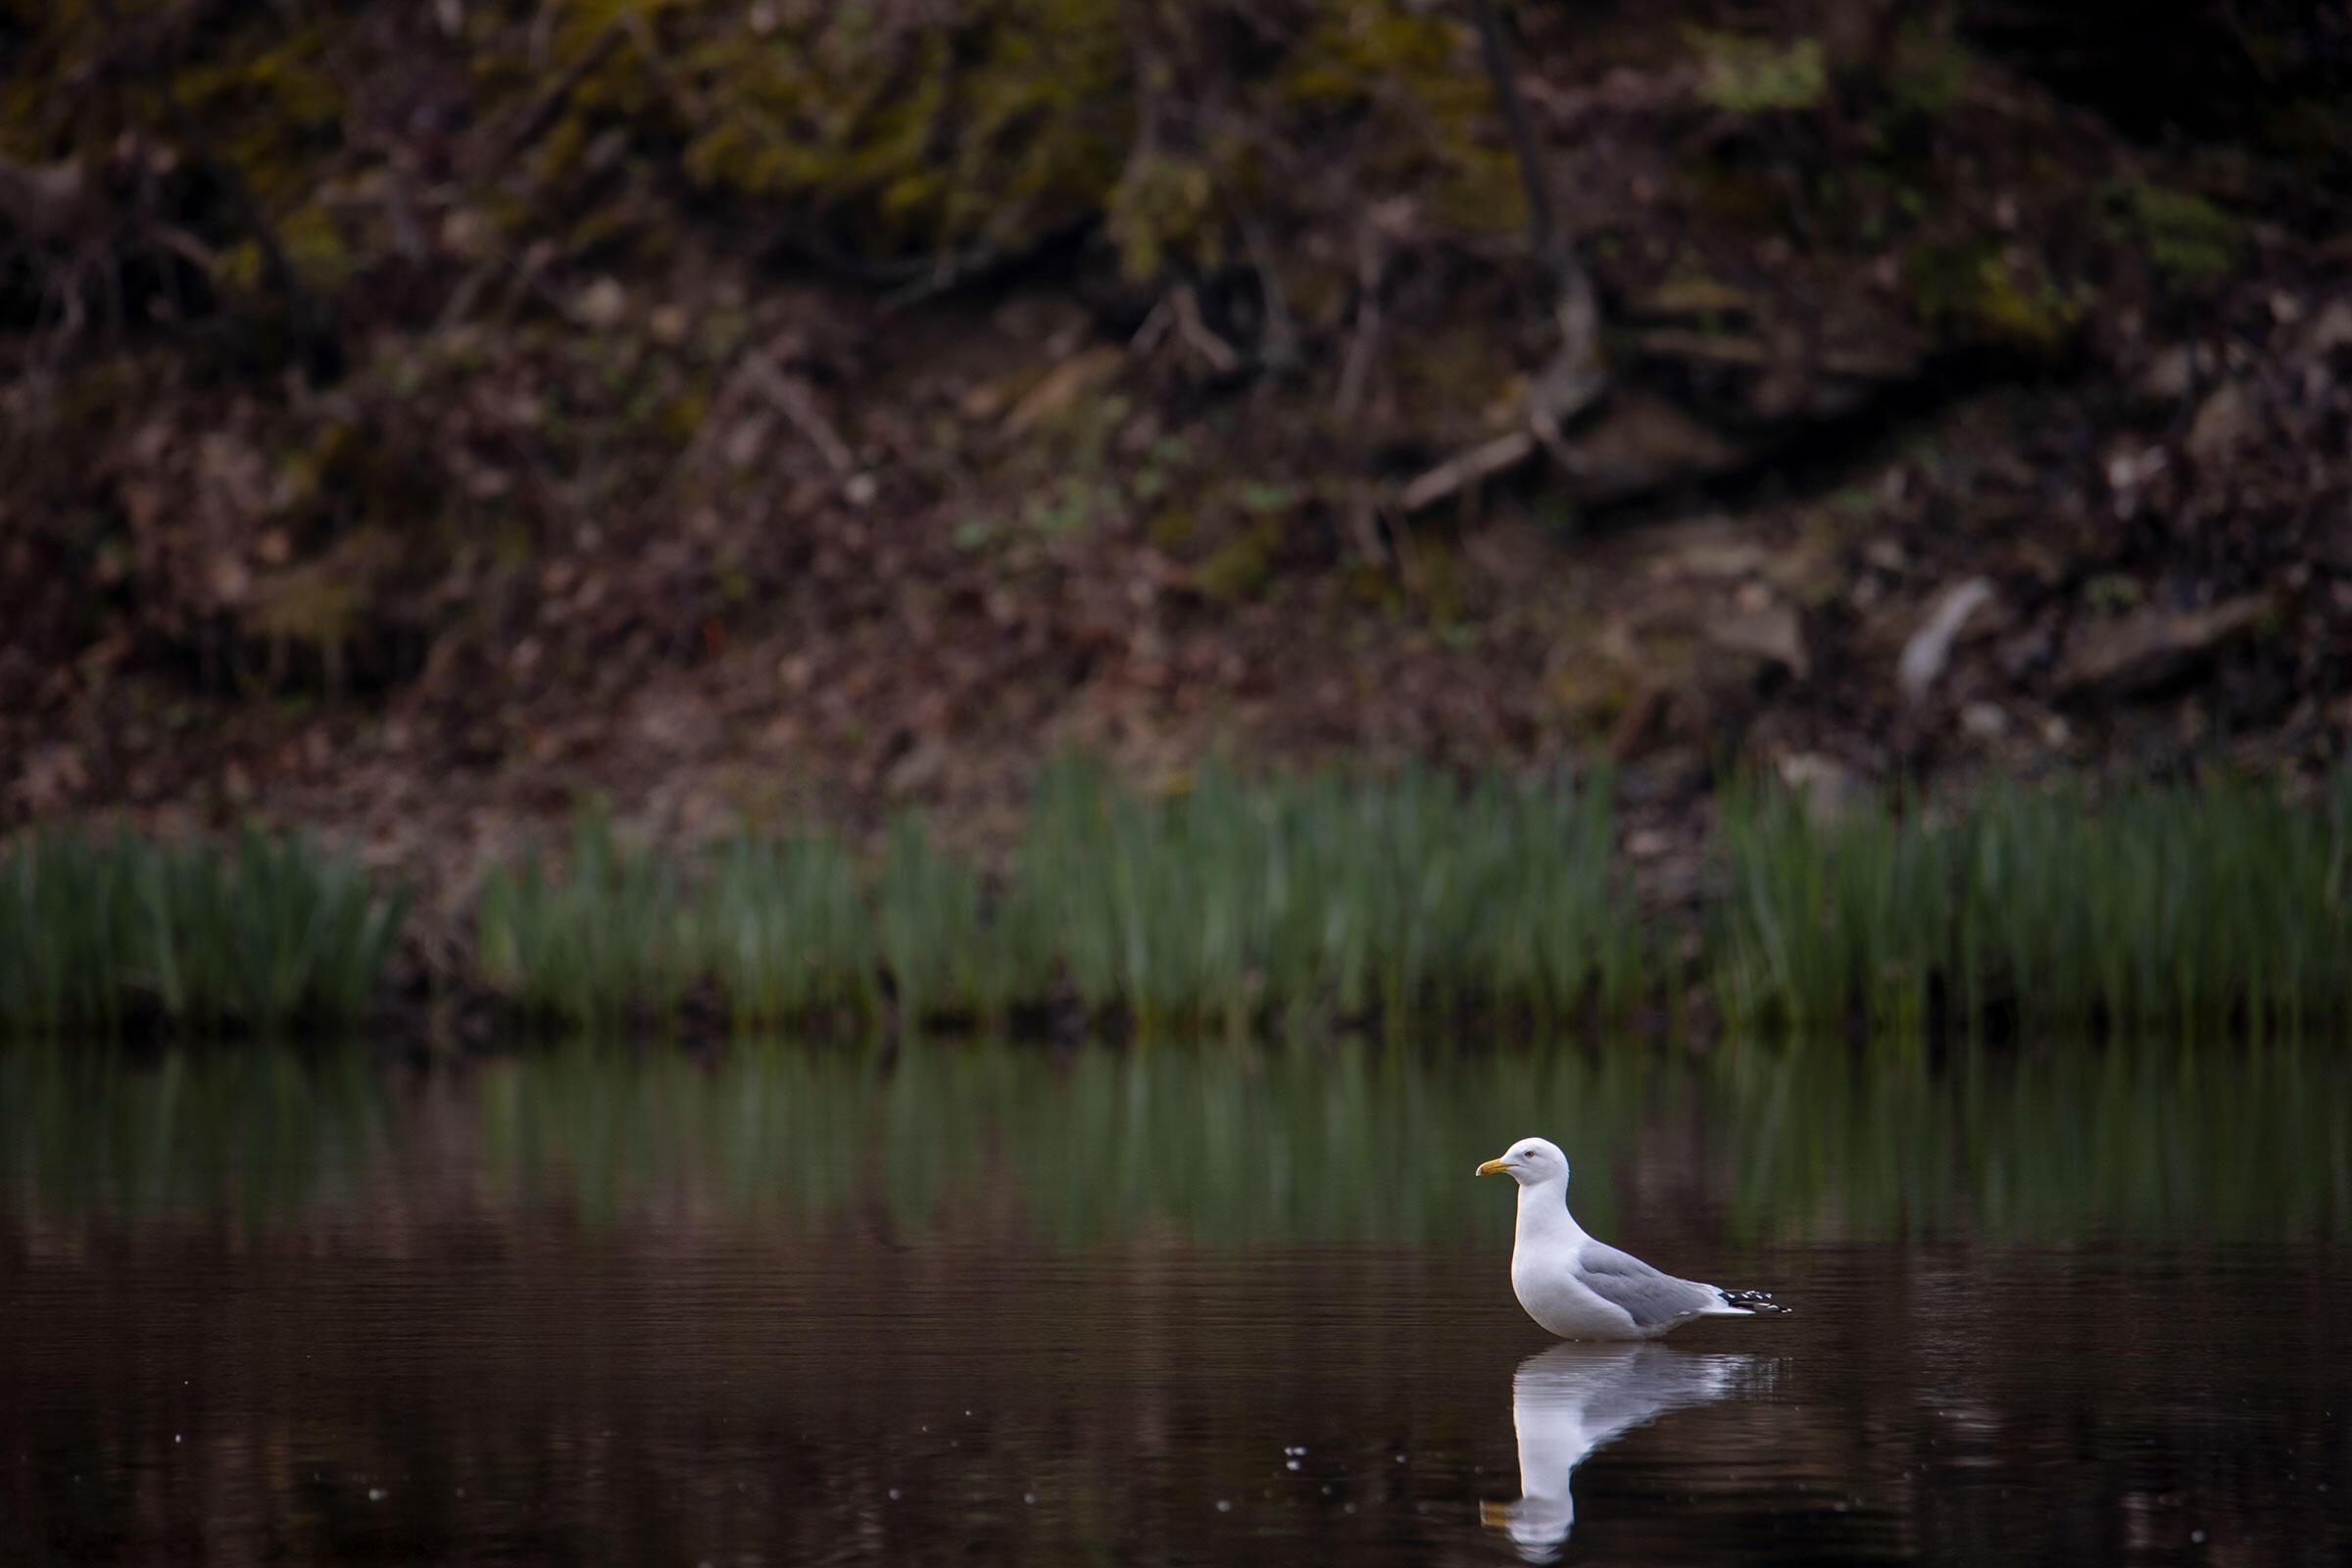 Herring Gull. Karthika Gopalakrishnan, Pittsburgh, PA